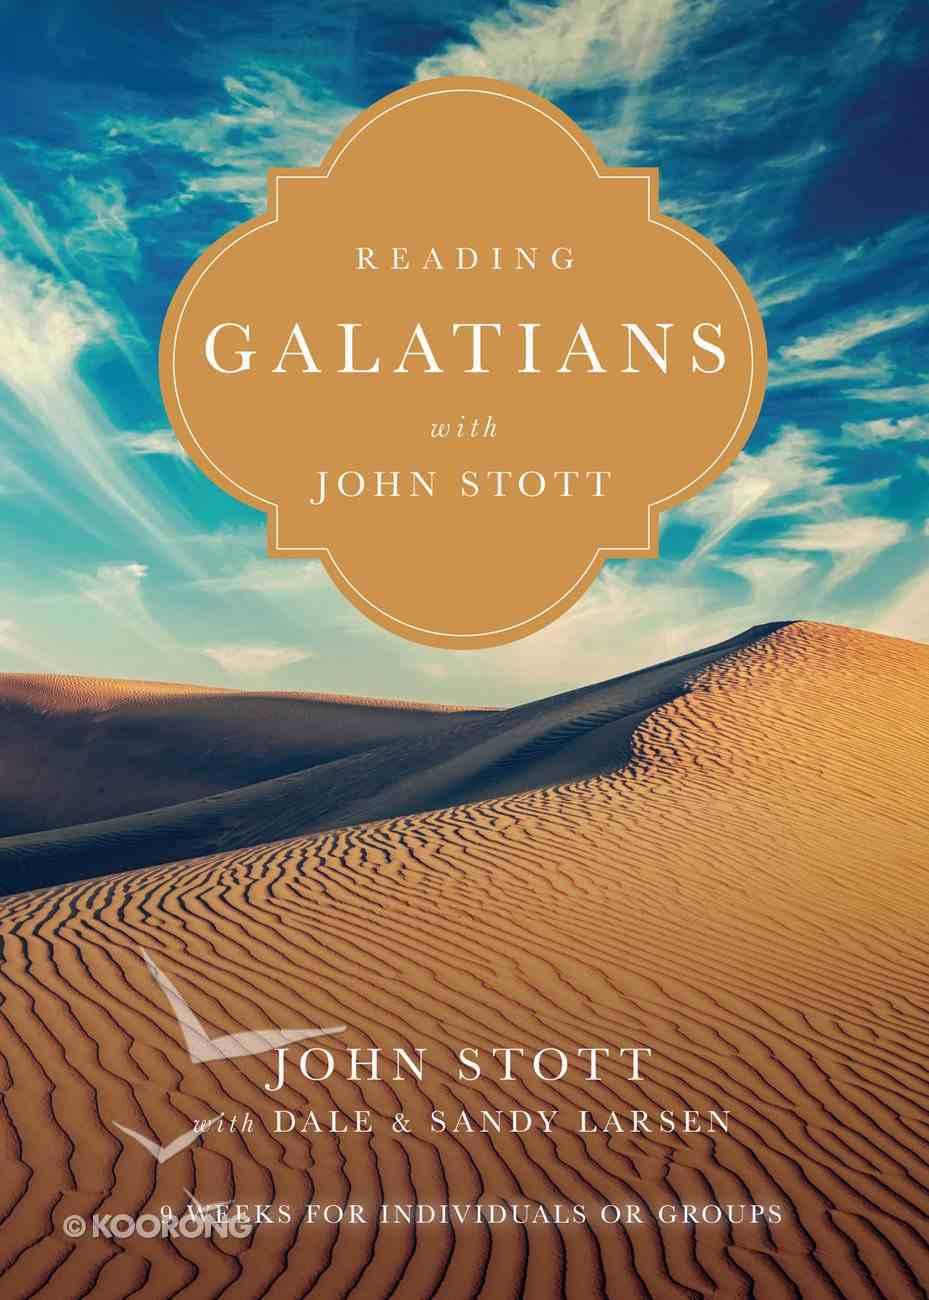 Reading Galatians With John Stott (Reading The Bible With John Stott Series) eBook